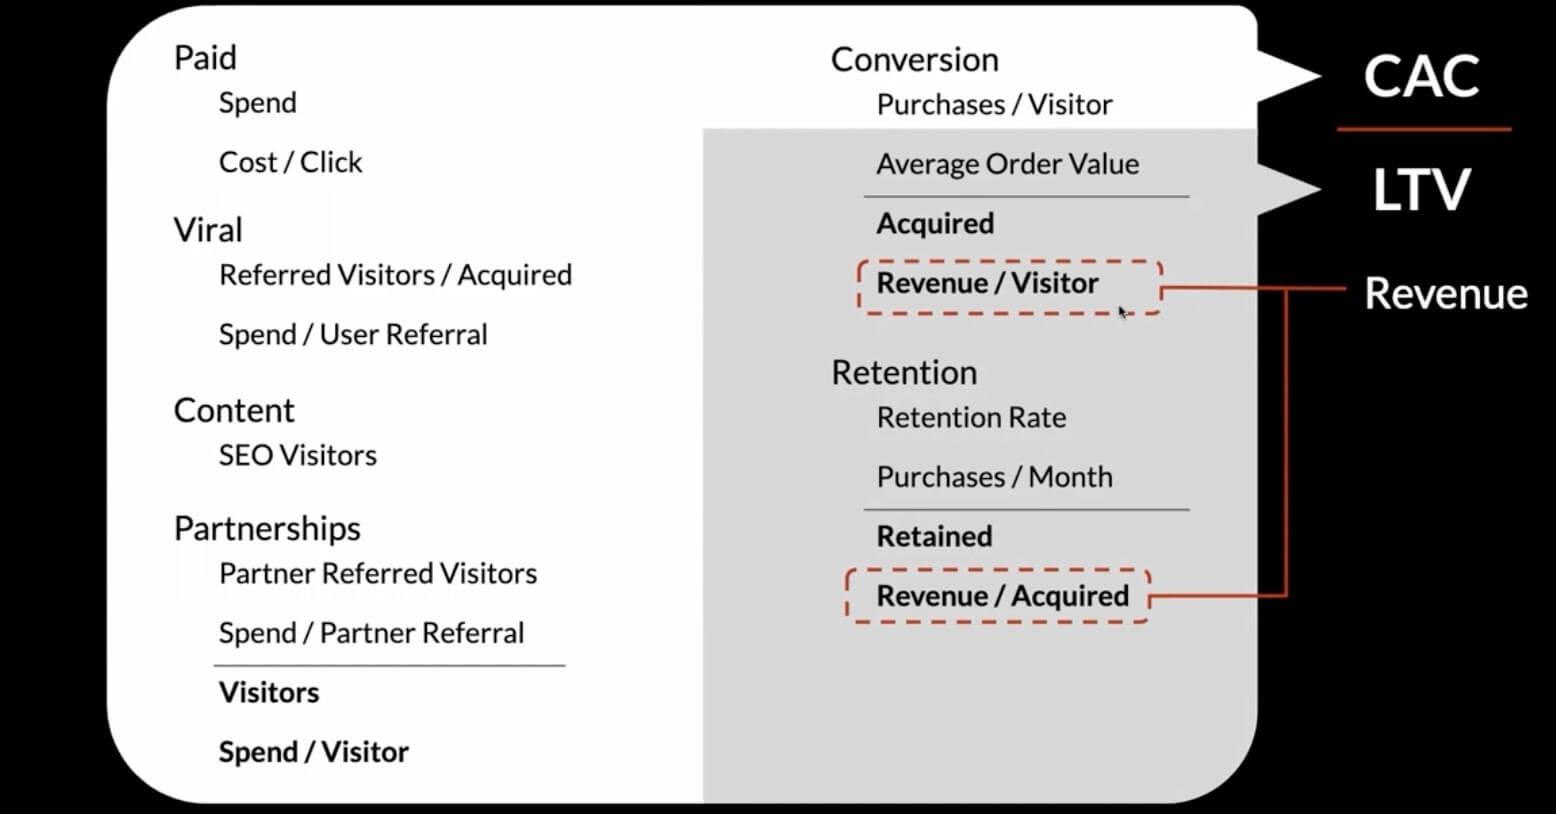 revenue - the two core metrics